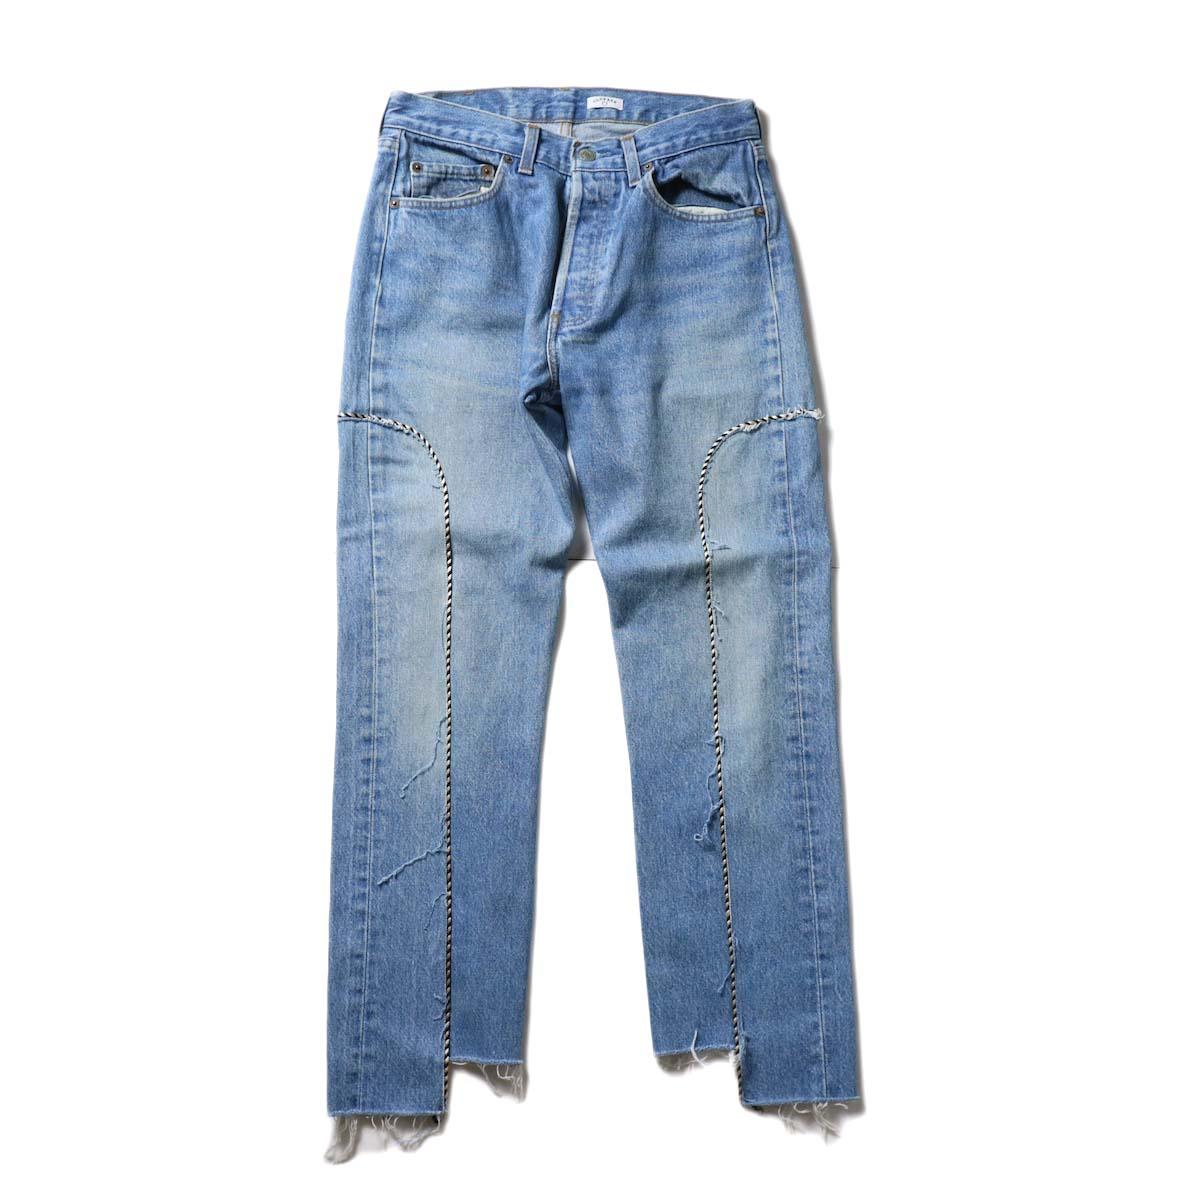 OLD PARK / Western Jeans Blue (Ssize-D)正面